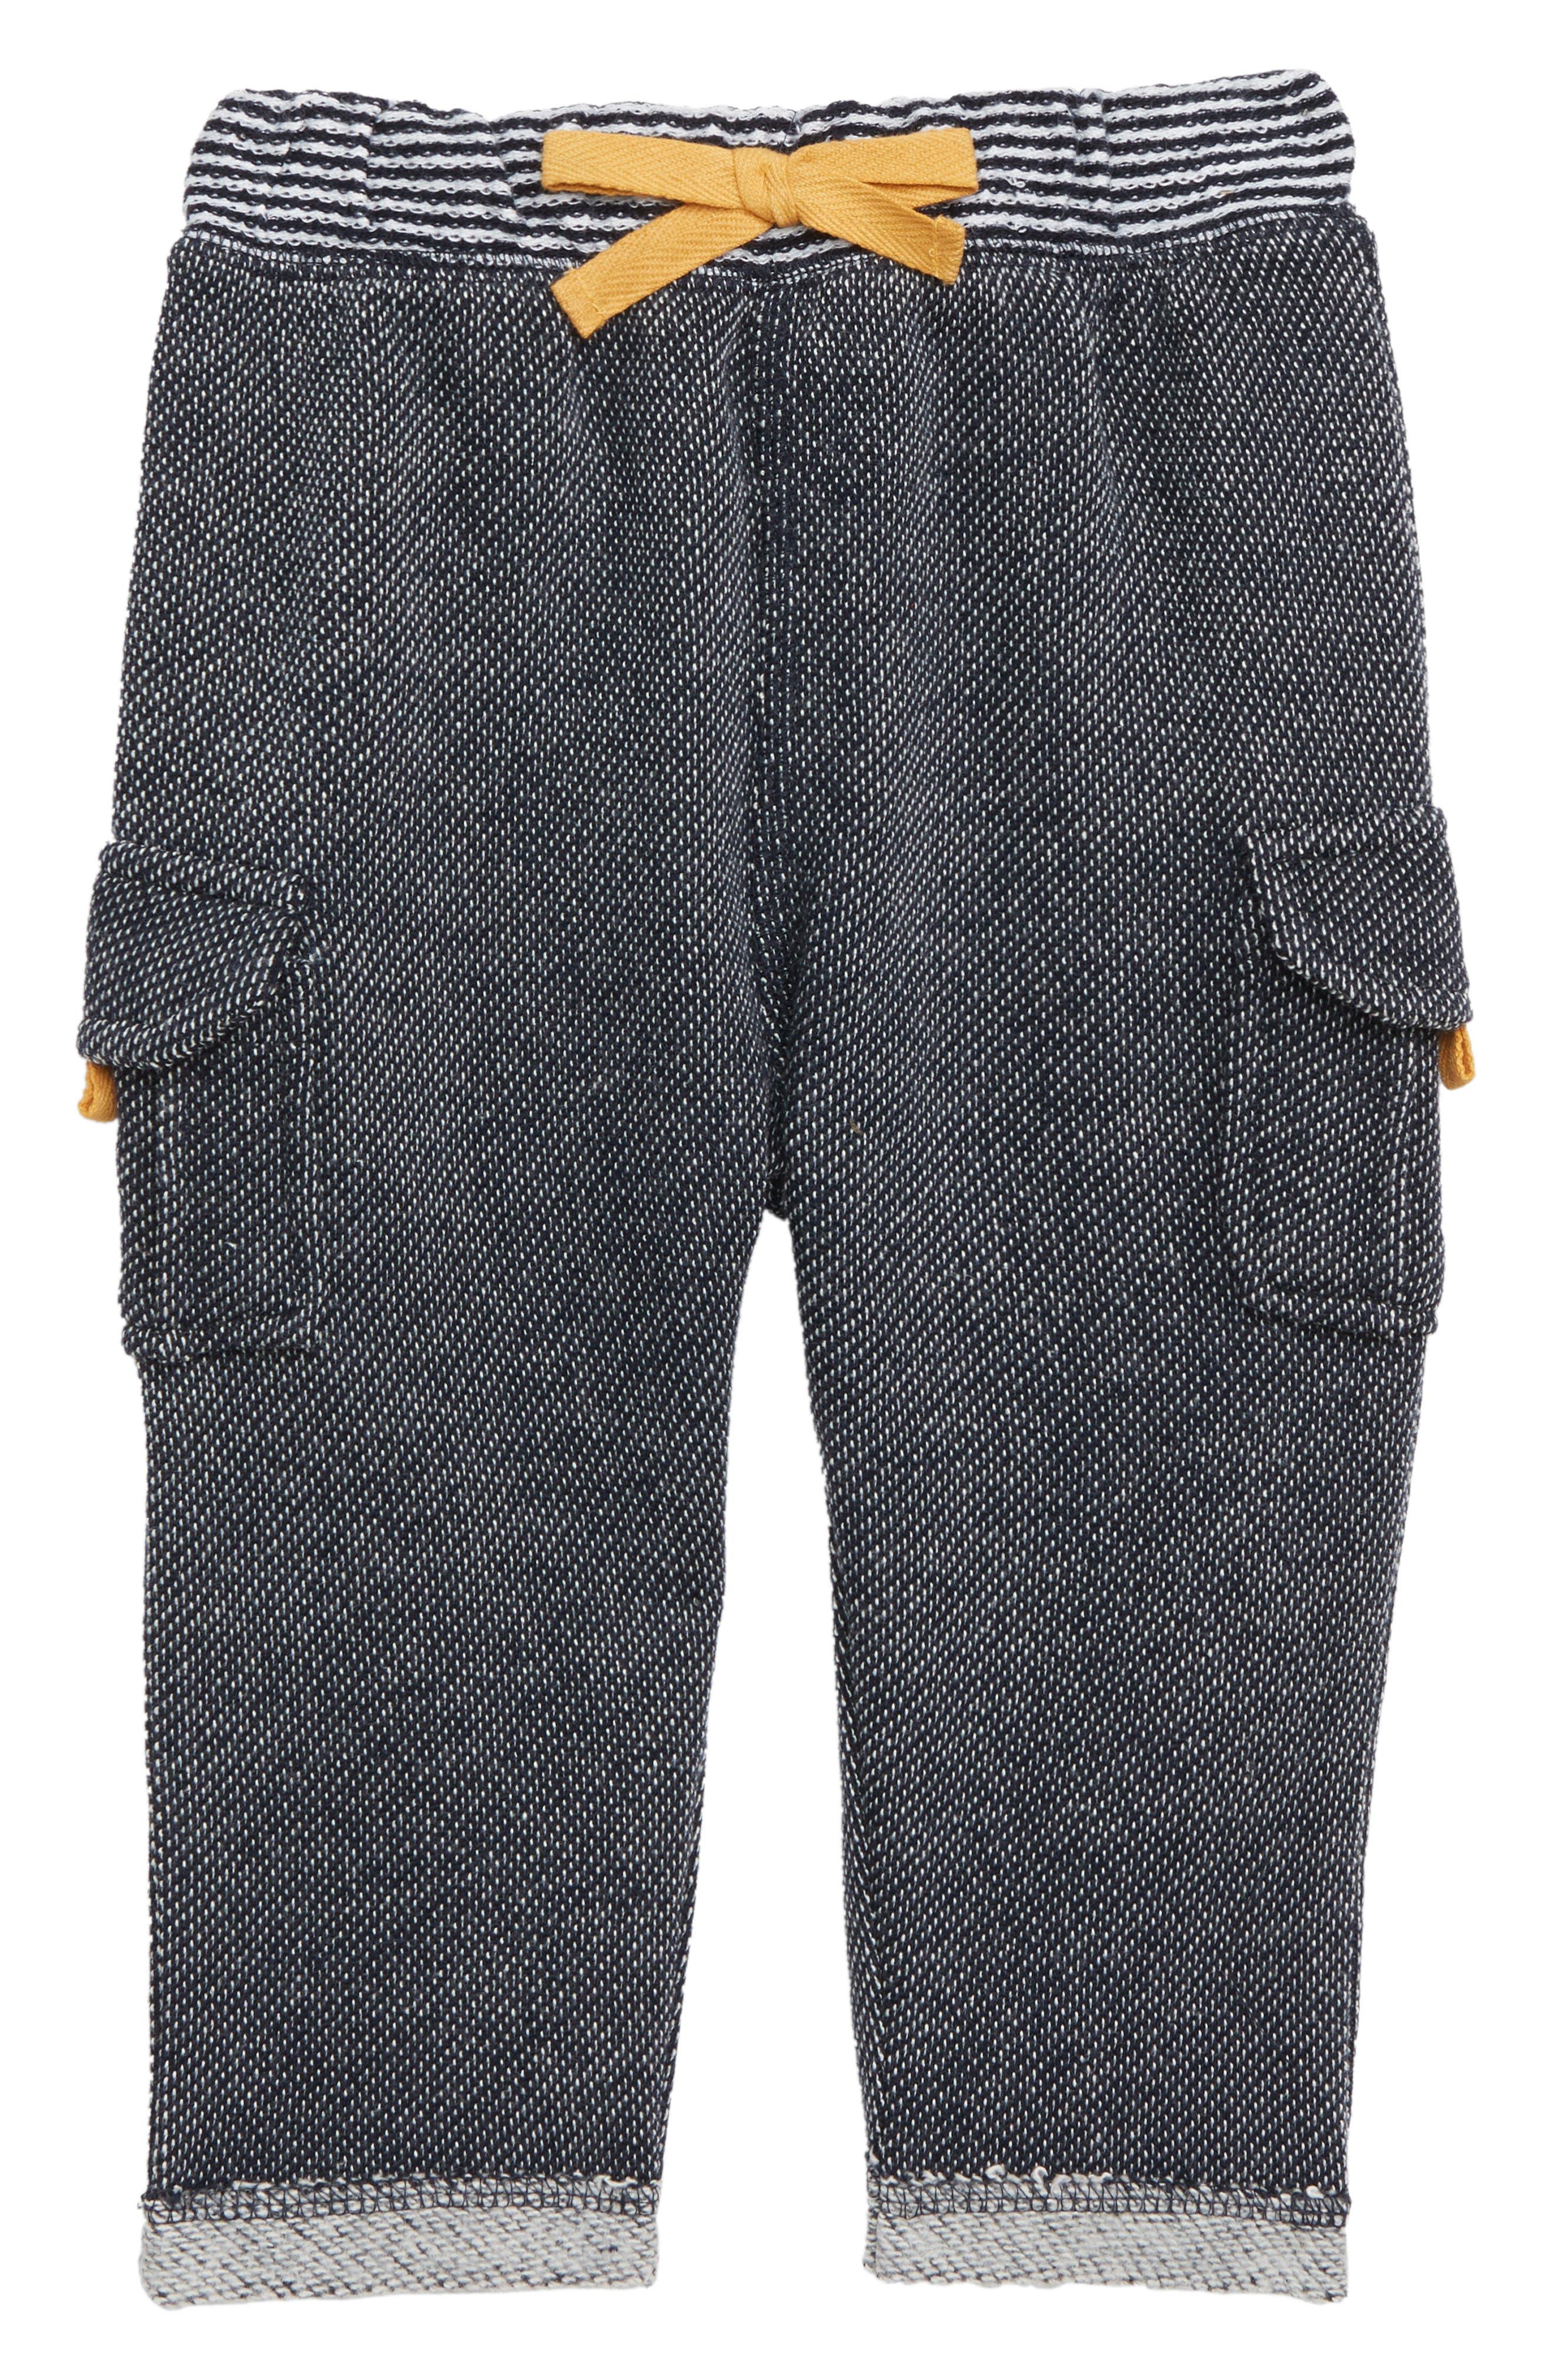 Infant Boys Peek Milo Jogger Pants Size S (36m)  Blue